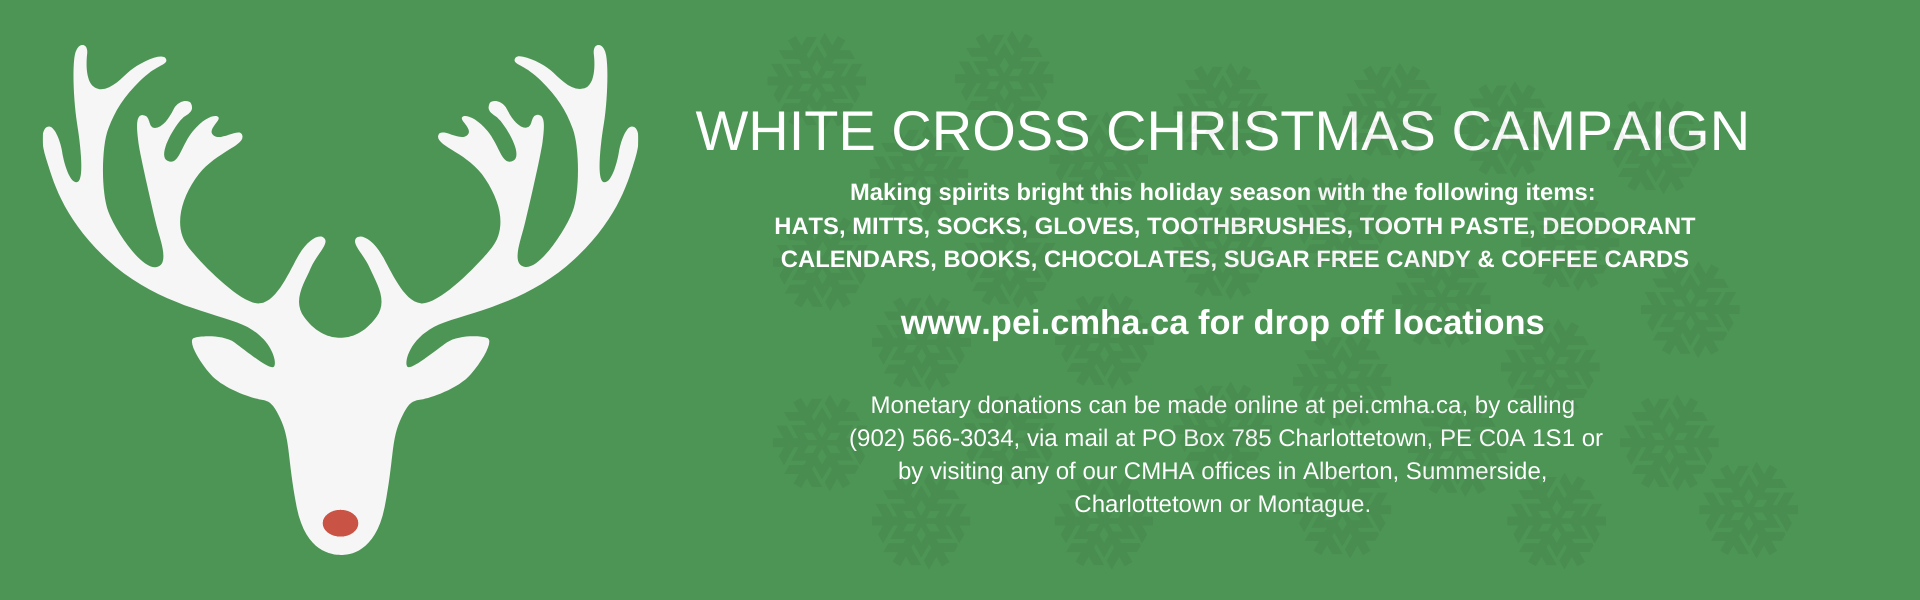 White Cross Christmas Campaign